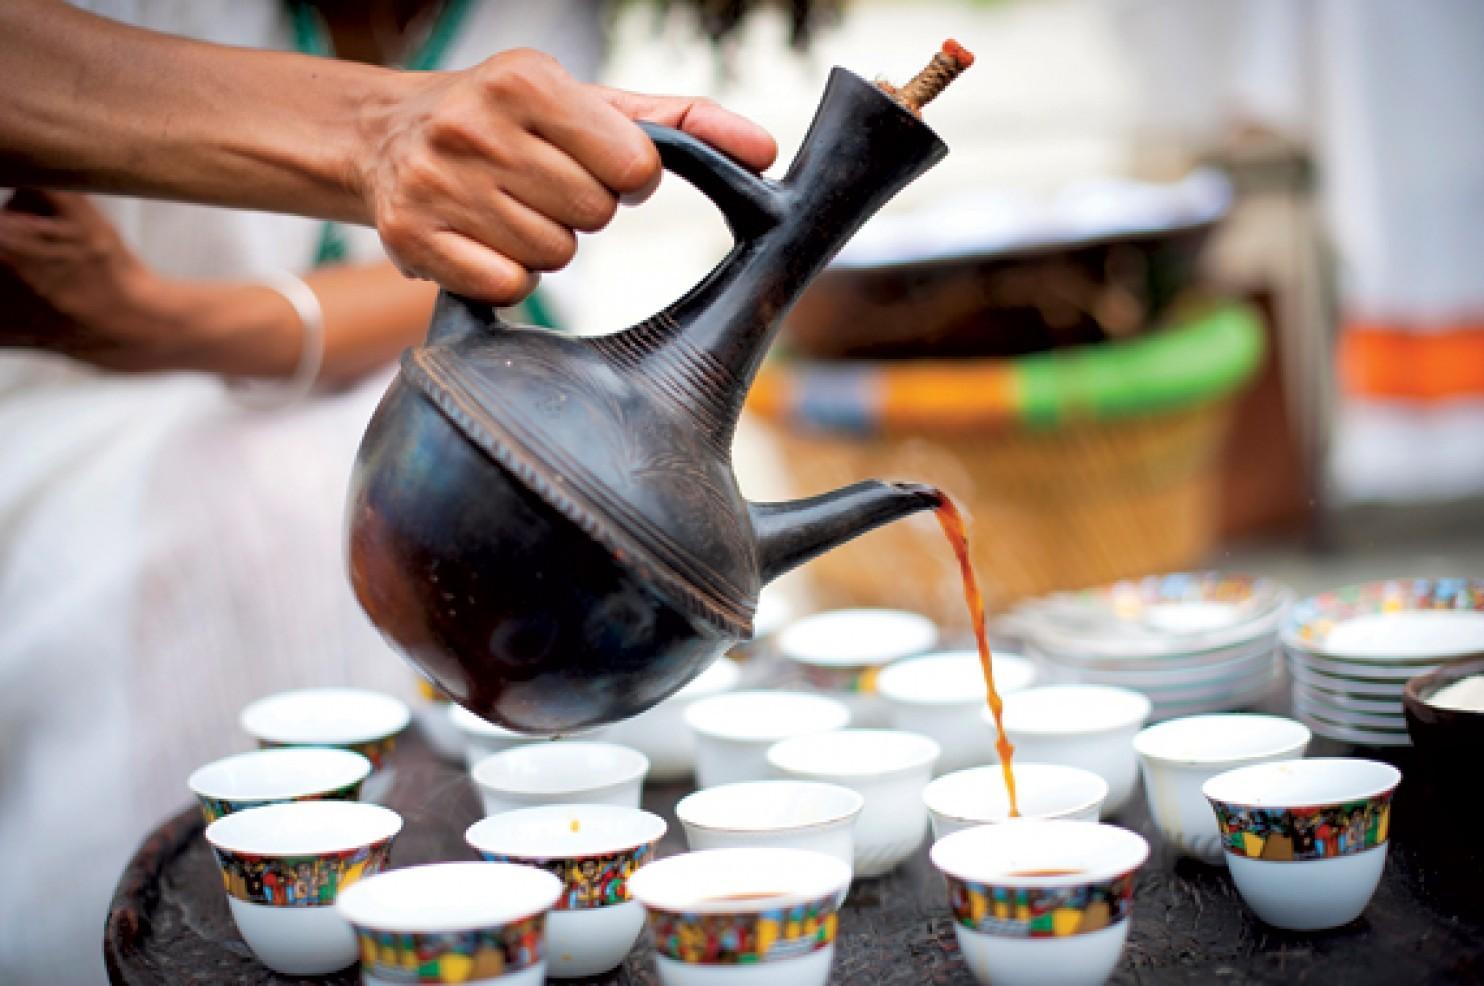 History Of Coffee - Ethiopian Coffee Ceremony - FrizeMedia - Charles Friedo Frize - Digital Marketing And Advertising